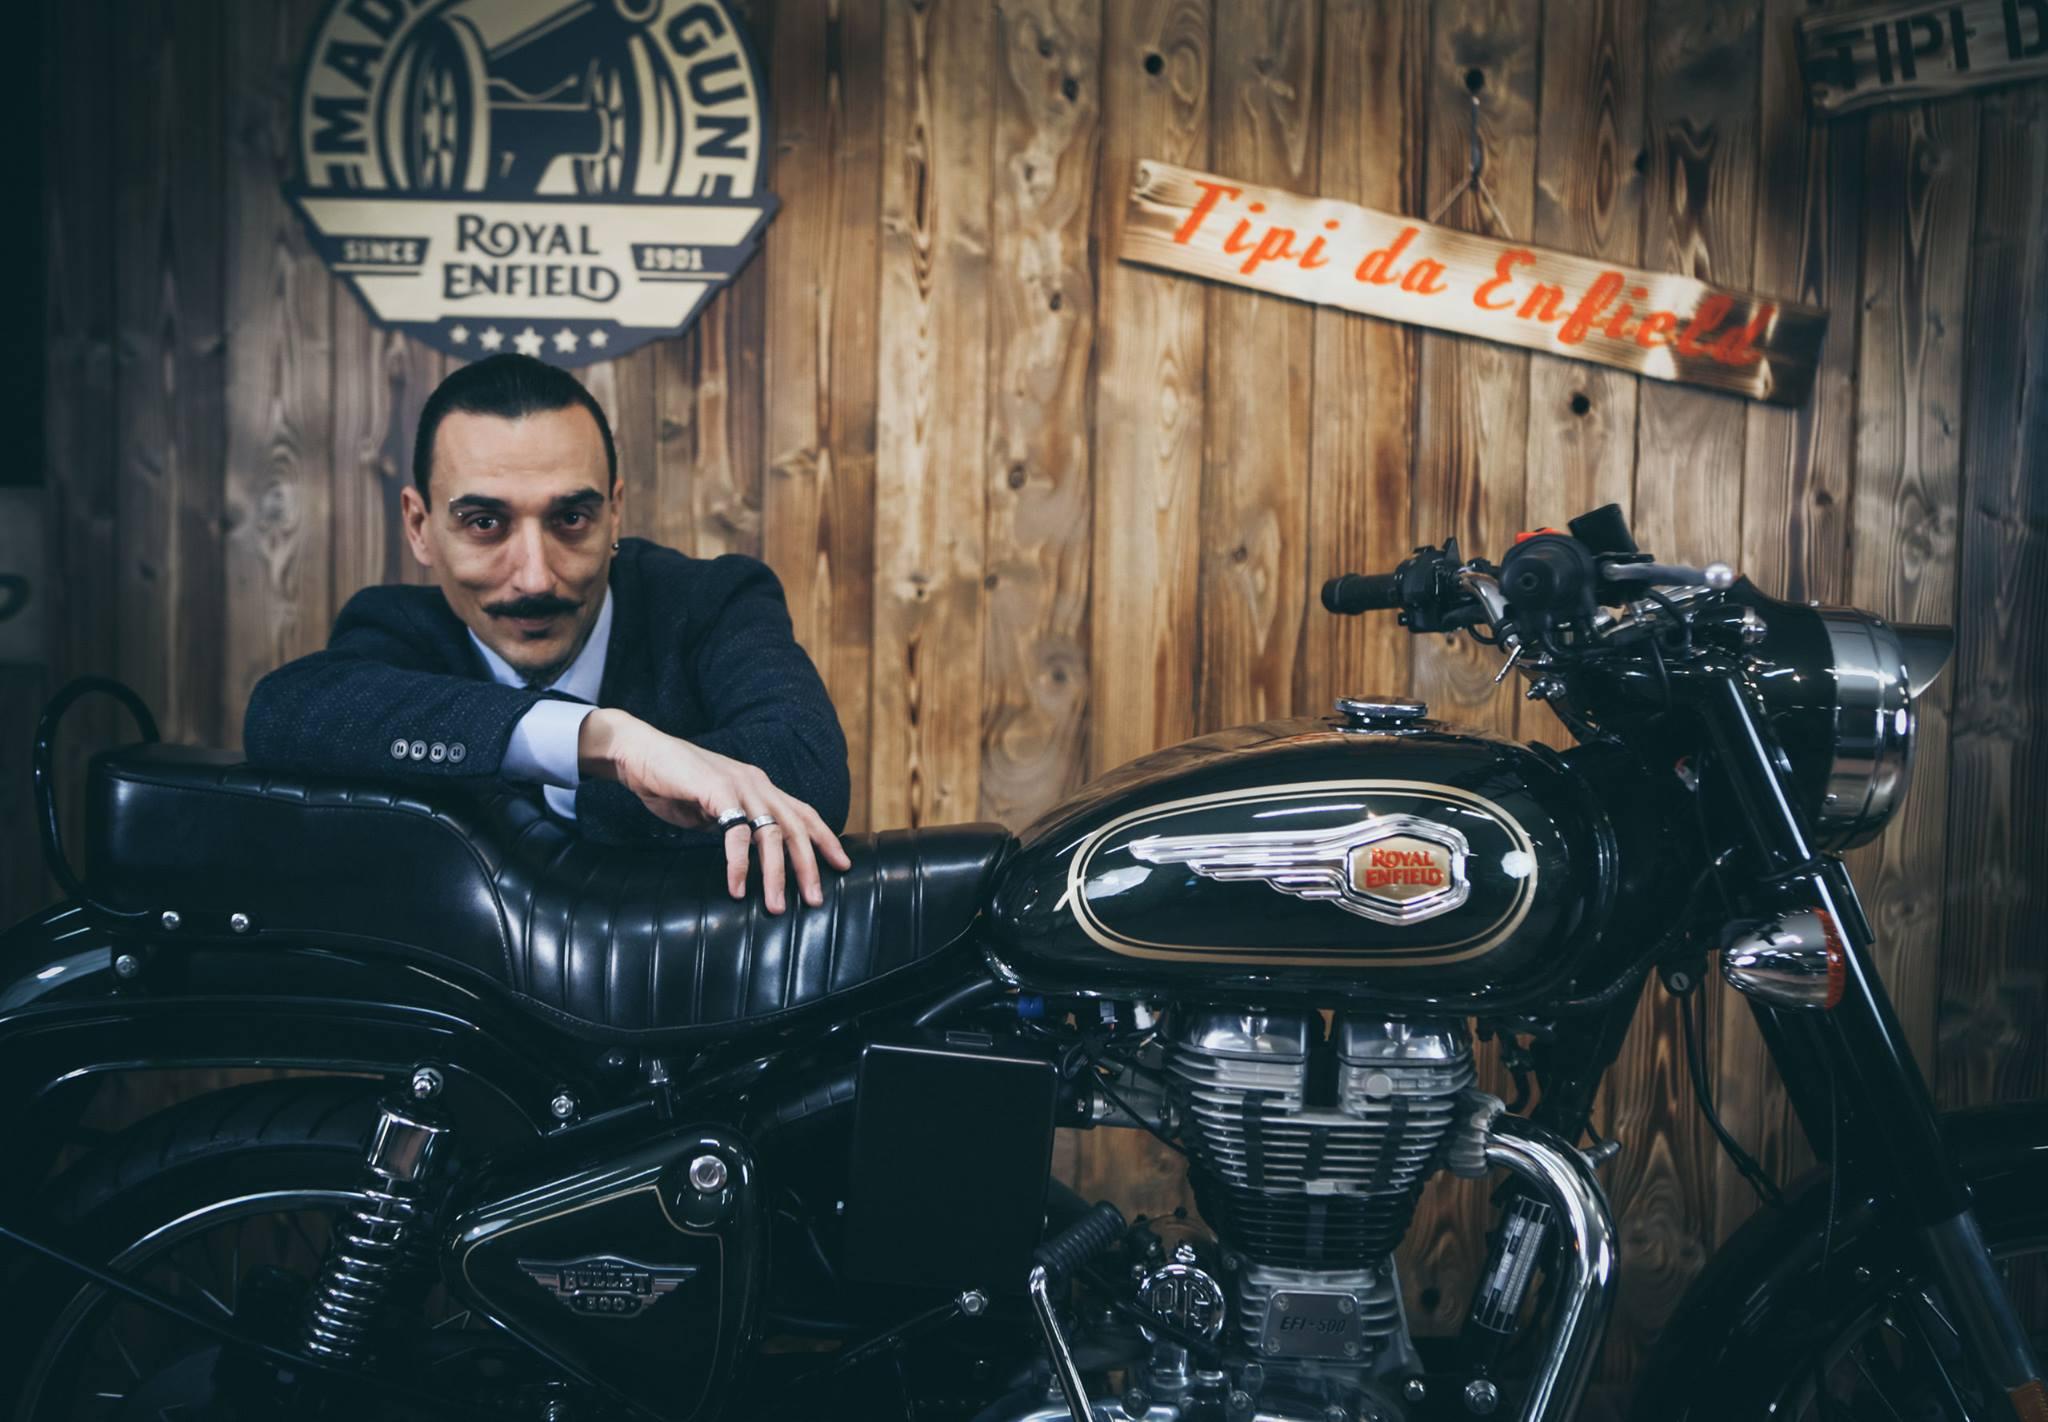 royal-enfield-piacenza-moruzzi-moto-wonderland-campagna-promo-14